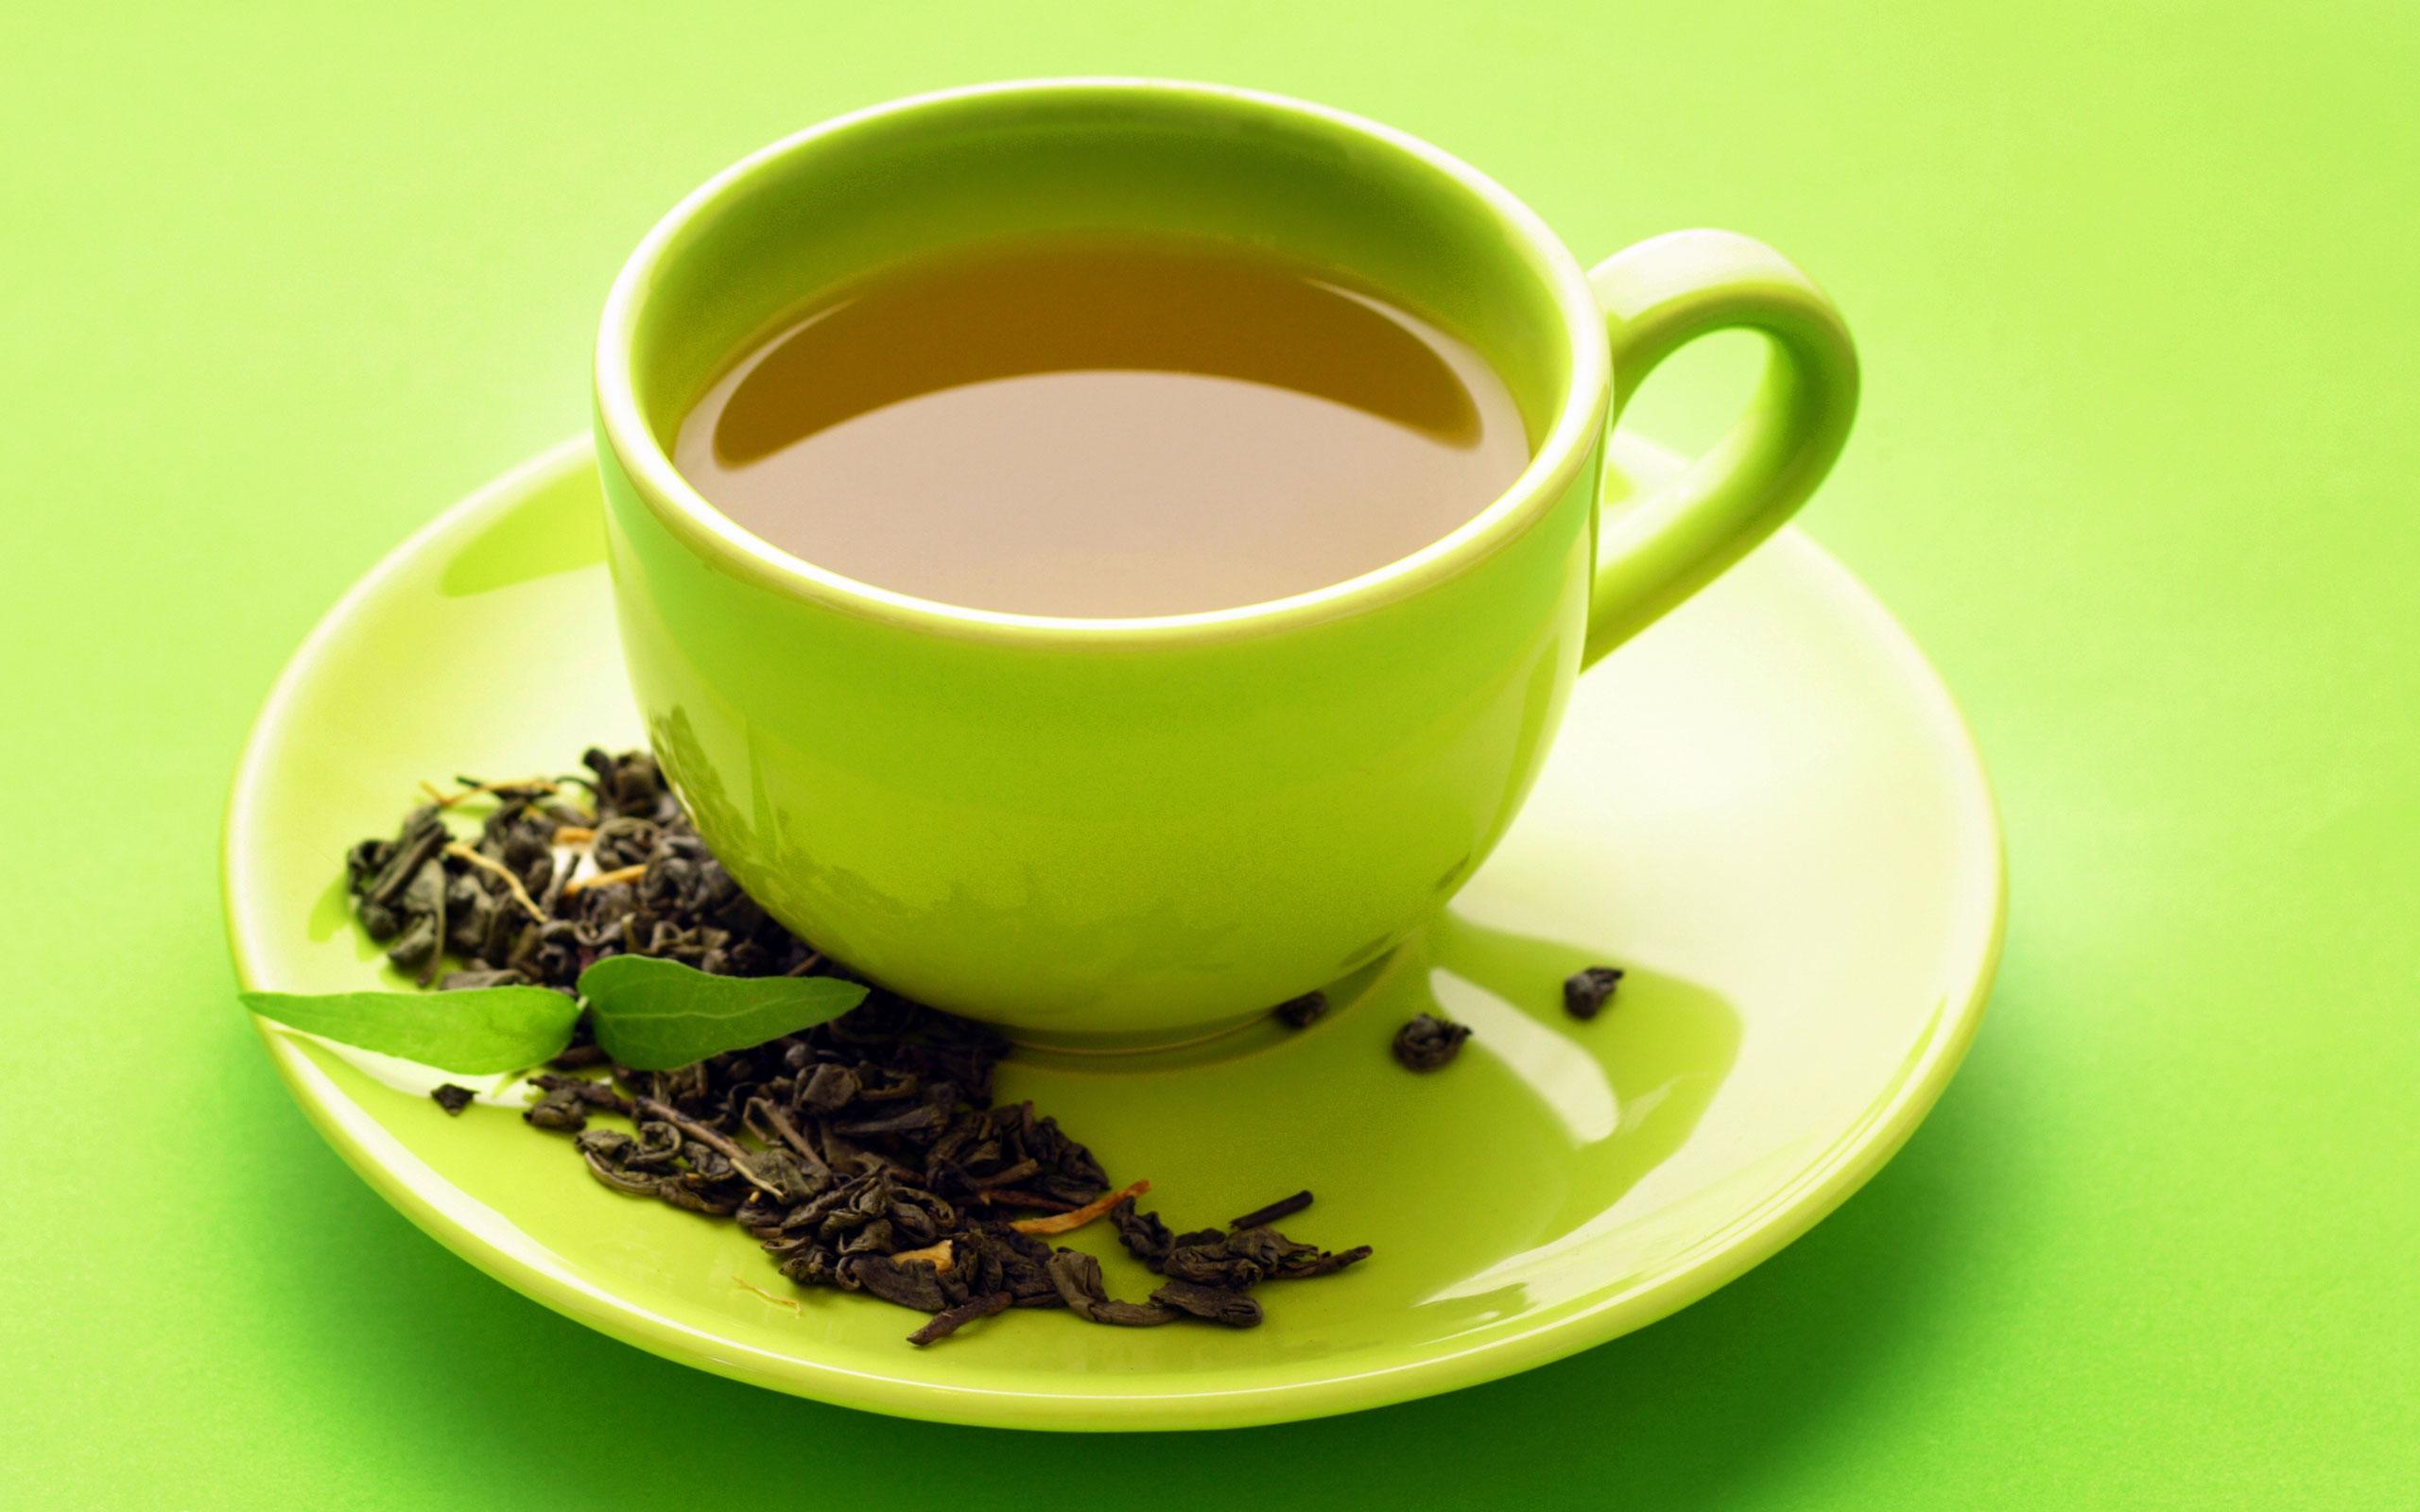 Cup green tea